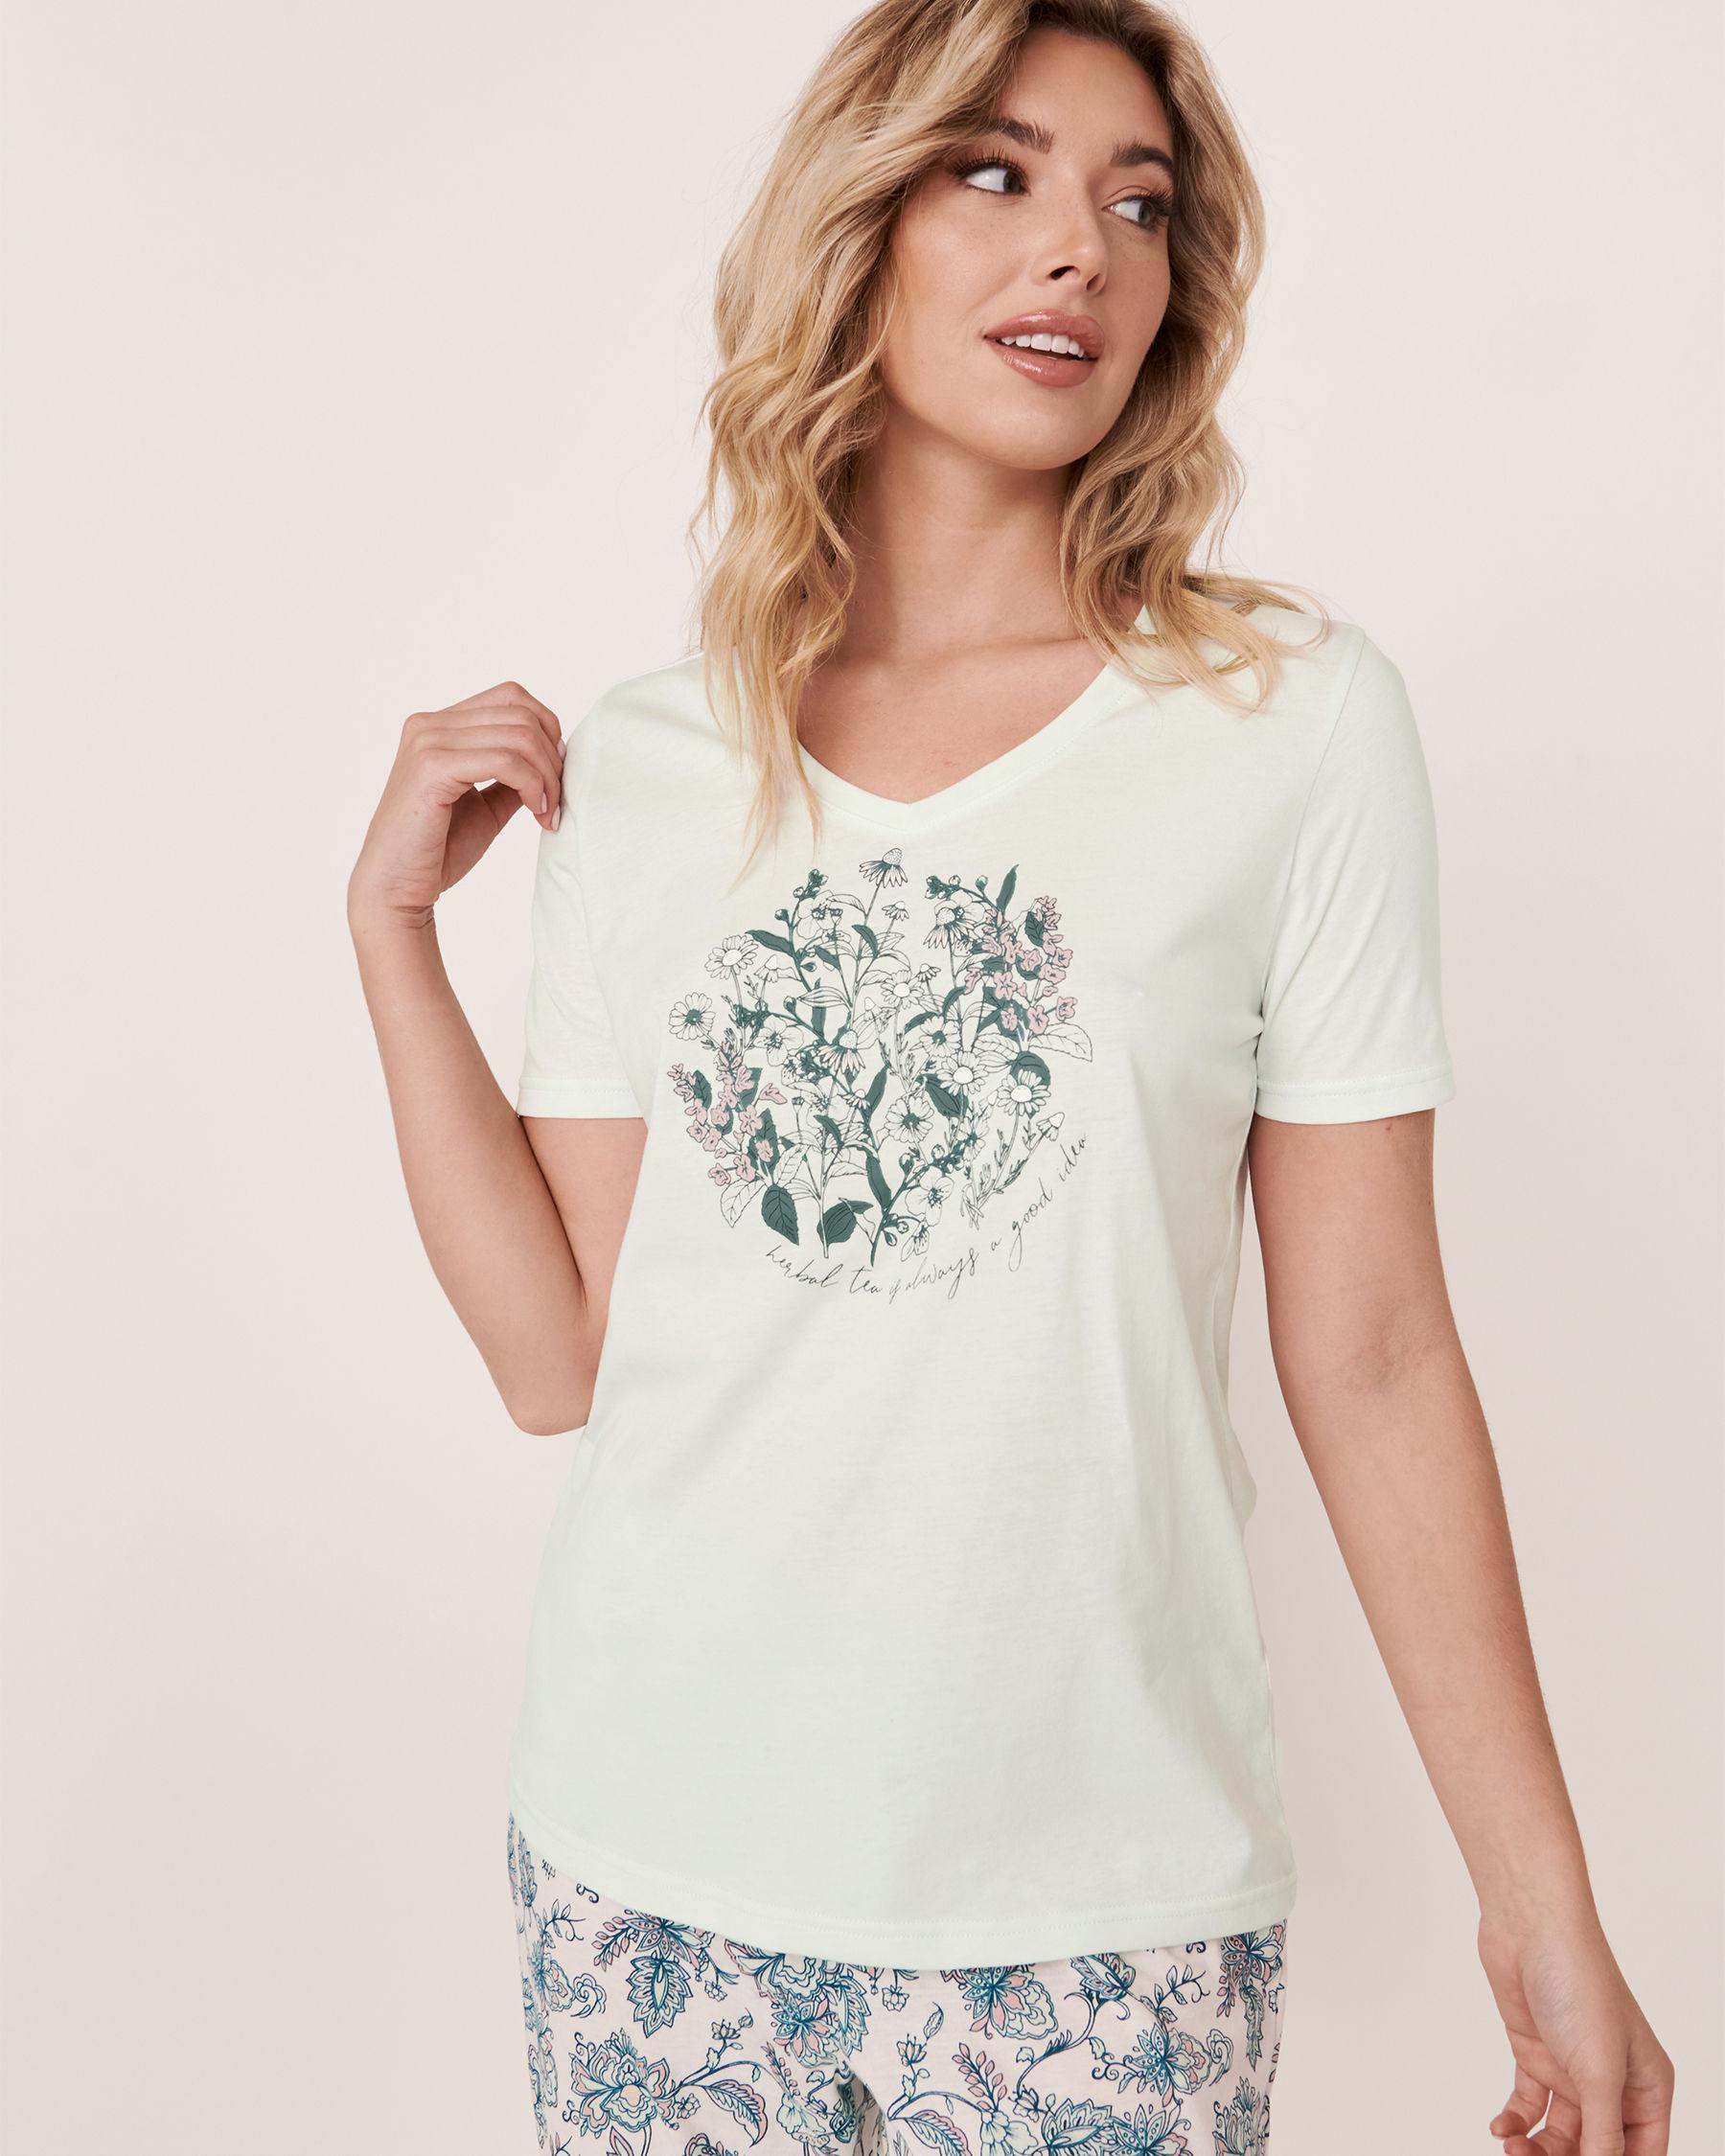 LA VIE EN ROSE V-neckline T-shirt Light aqua 40100180 - View3